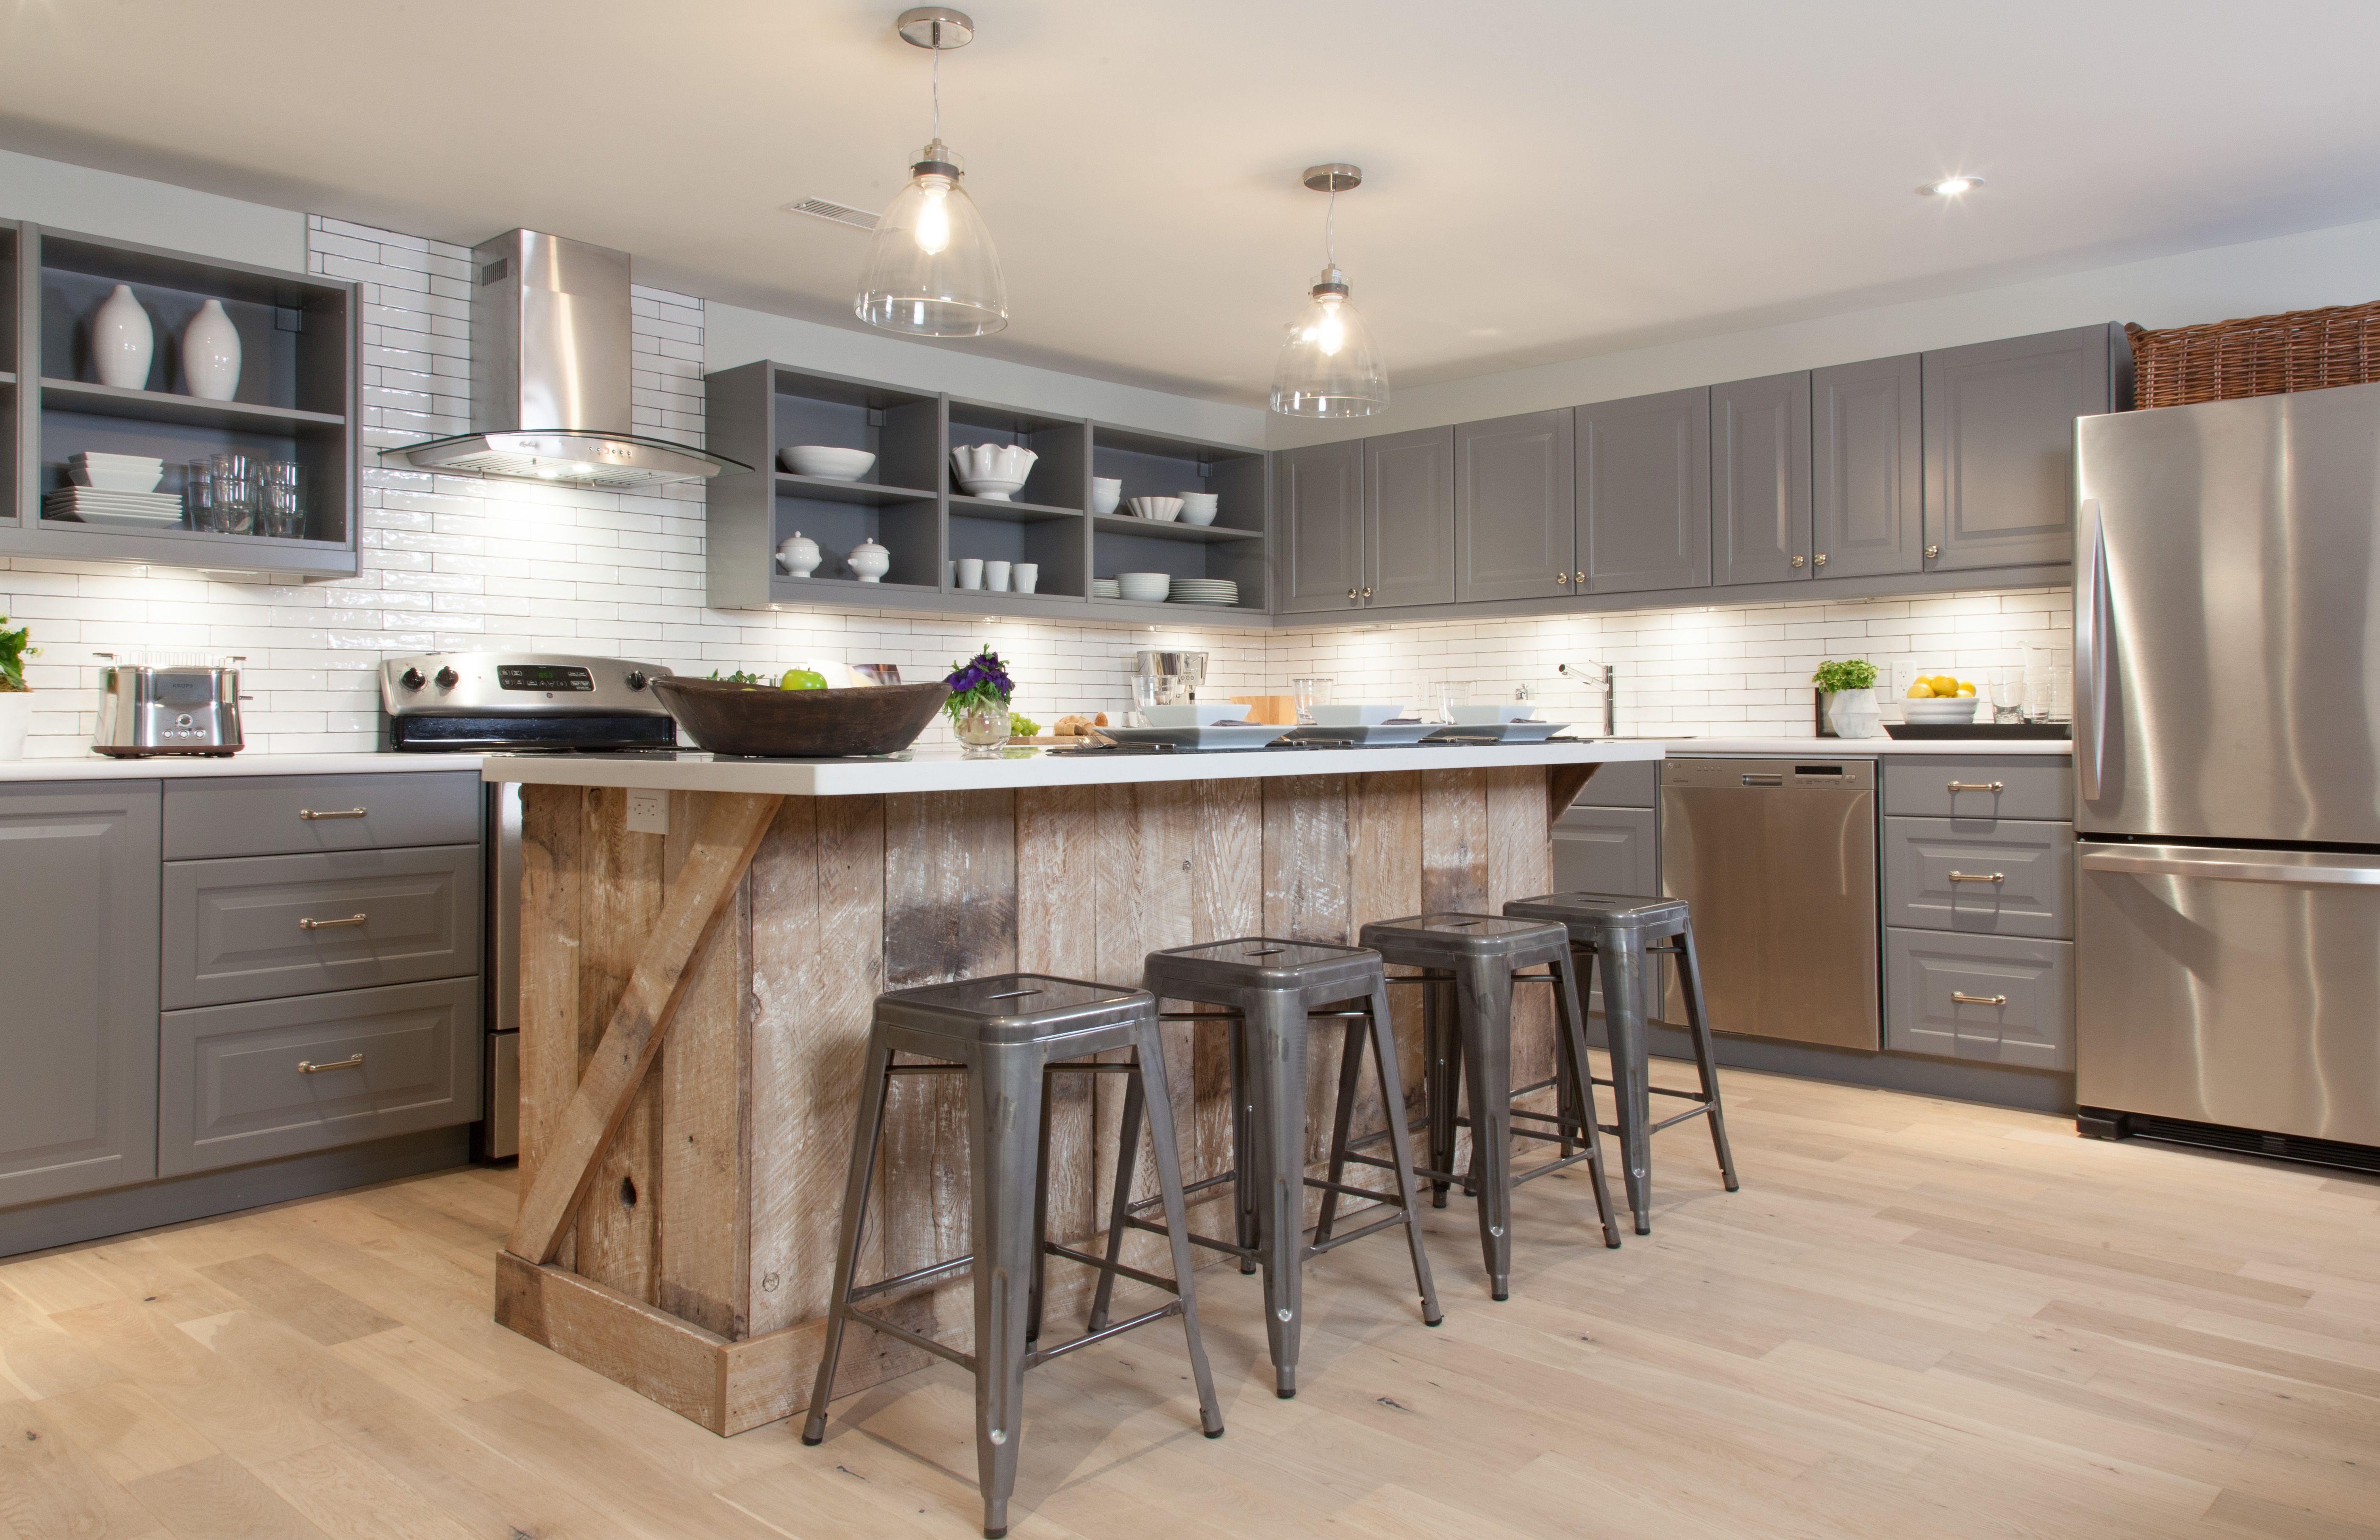 Income Property: Cory & Julie - Scott McGillivray | Modern ...